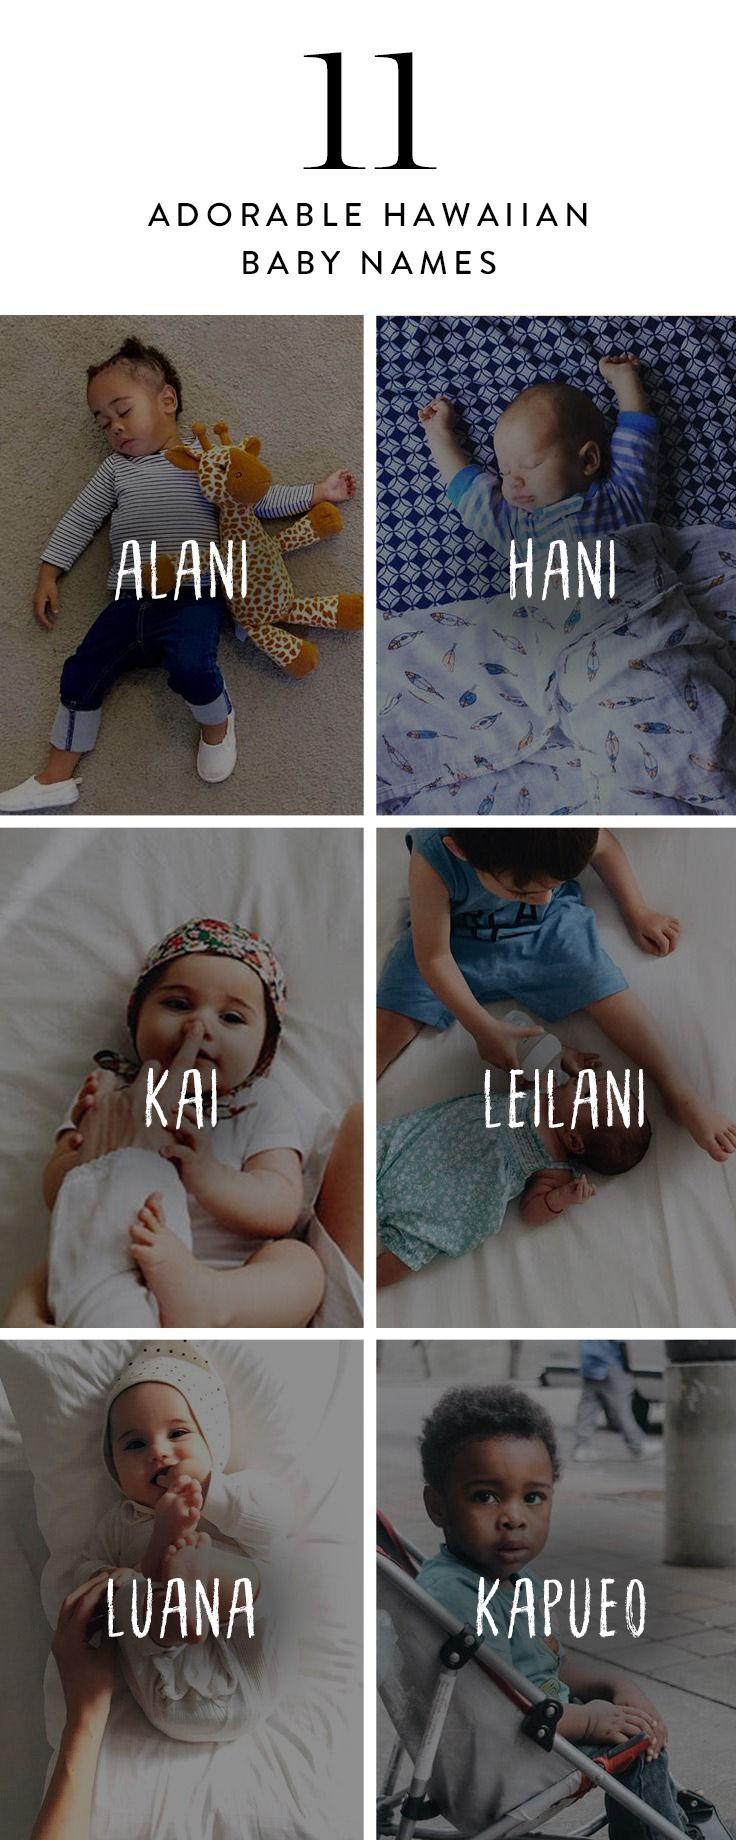 Top 1,000 Baby Girl Names